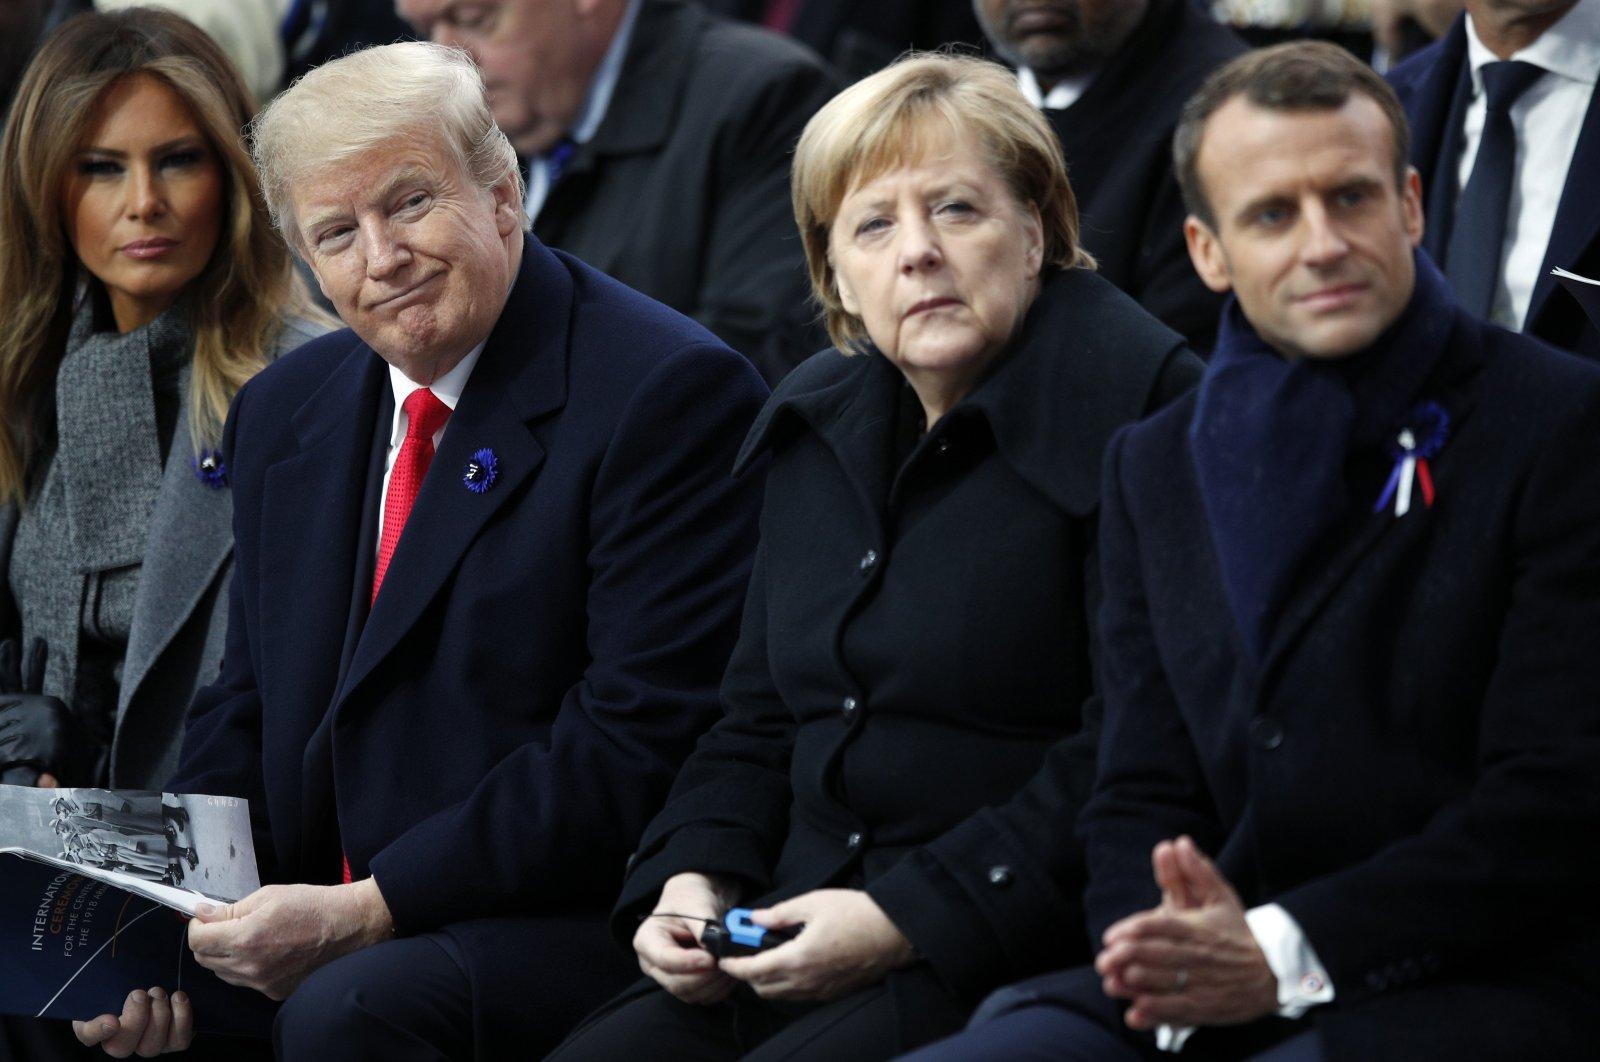 U.S President Donald Trump, German Chancellor Angela Merkel and French President Emmanuel Macron attend ceremonies at the Arc de Triomphe, Paris, Nov. 11, 2018. (AP Photo)